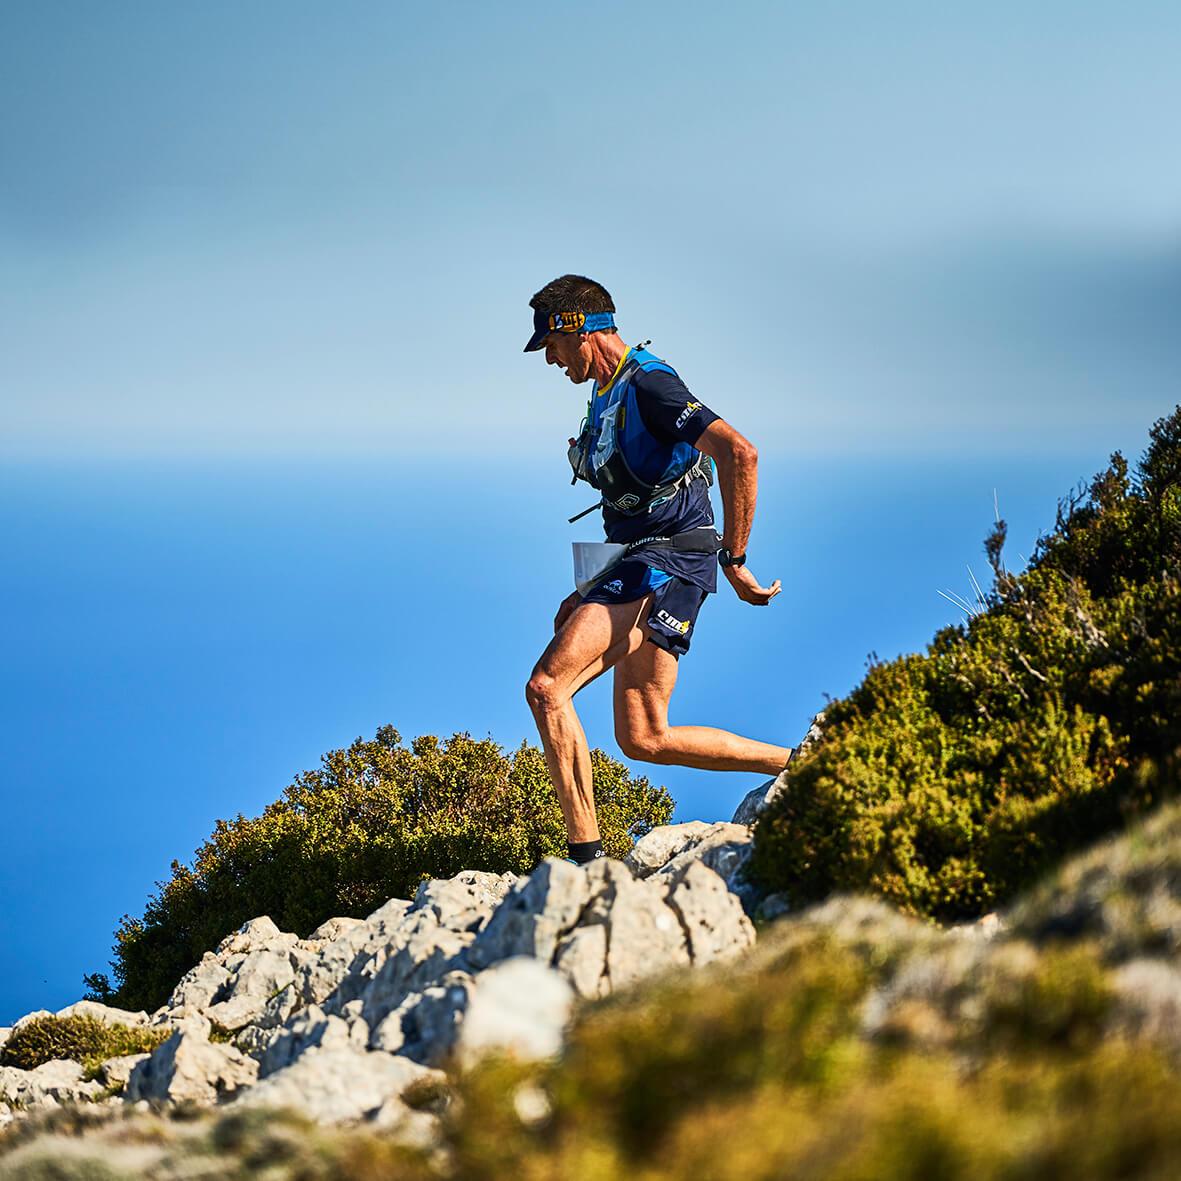 galatzo trail, Half Marathon Magaluf, la mejor Media maratón en Mallorca, Half Marathon Magaluf, the best half distance marathon in Mallorca